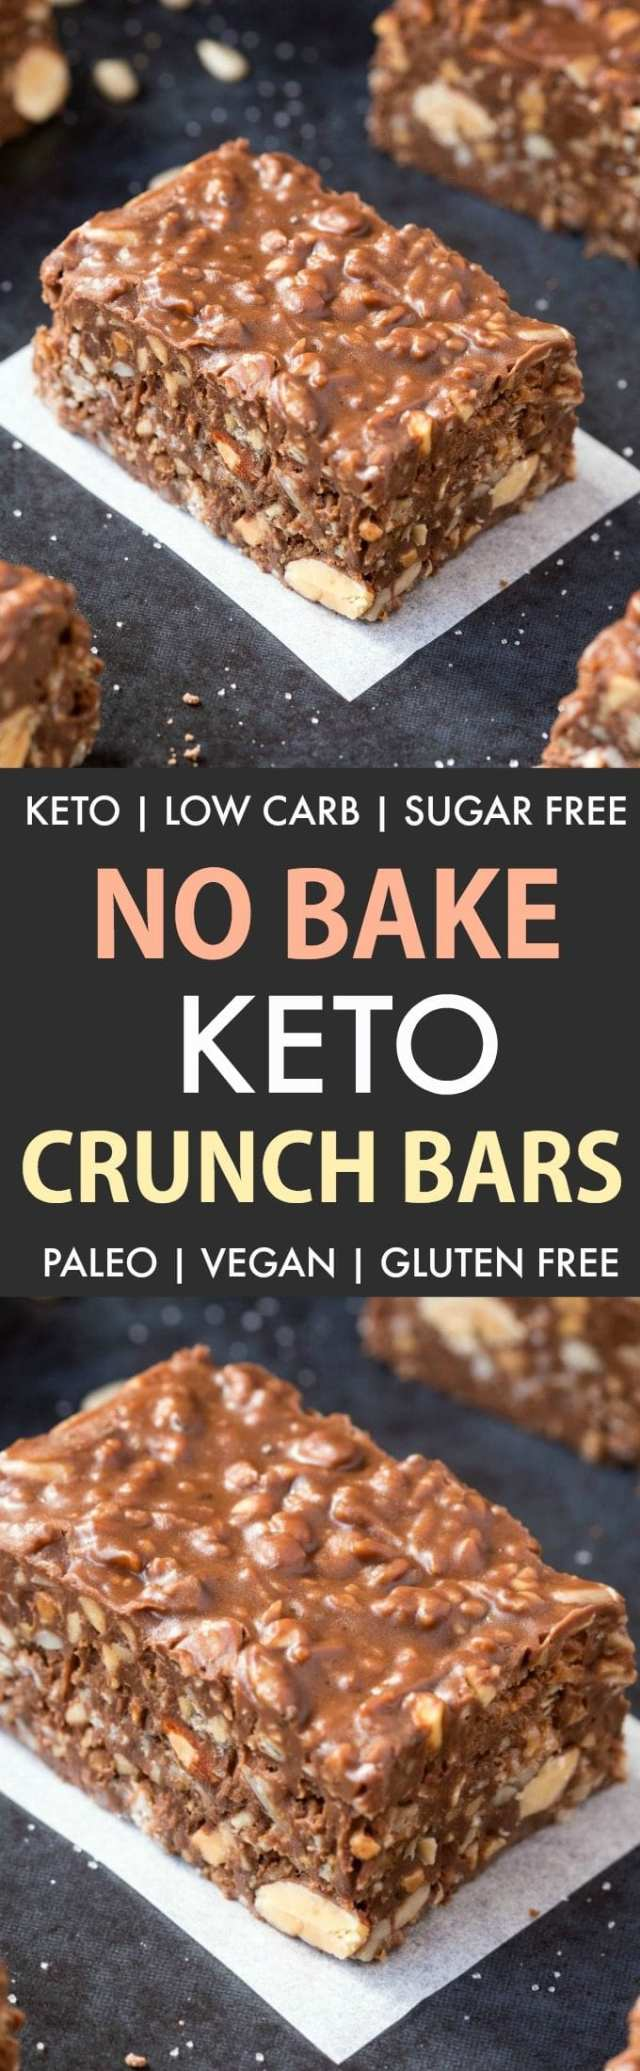 Homemade No Bake Keto Chocolate Crunch Bars (Paleo, Vegan, Sugar Free, Low Carb)- An easy recipe for copycat crunch bars with a ketosis and sugar-free makeover! The ultimate ketogenic dessert recipe ready in 5 minutes! #ketogenicdessert #ketodessert #lowcarb #sugarfree #paleo | Recipe on thebigmansworld.com